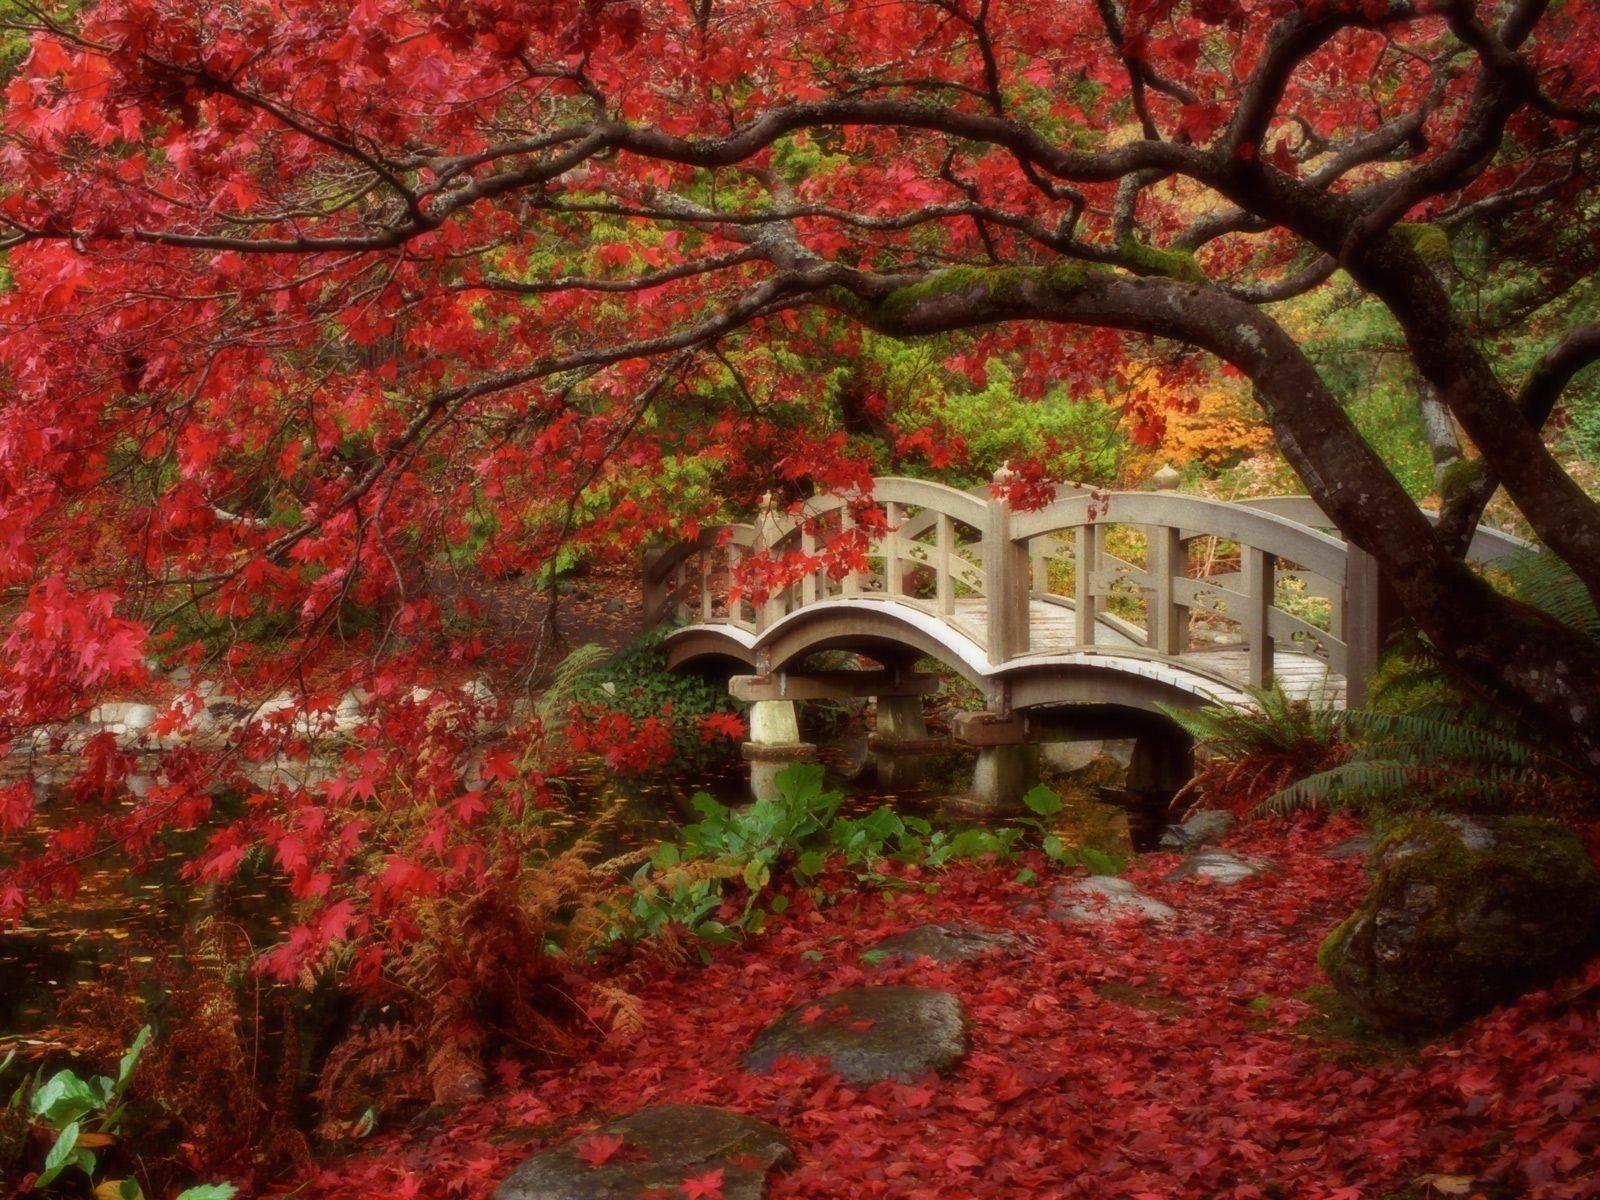 Come creare un giardino giapponese giardini orientali - Giardini giapponesi ...